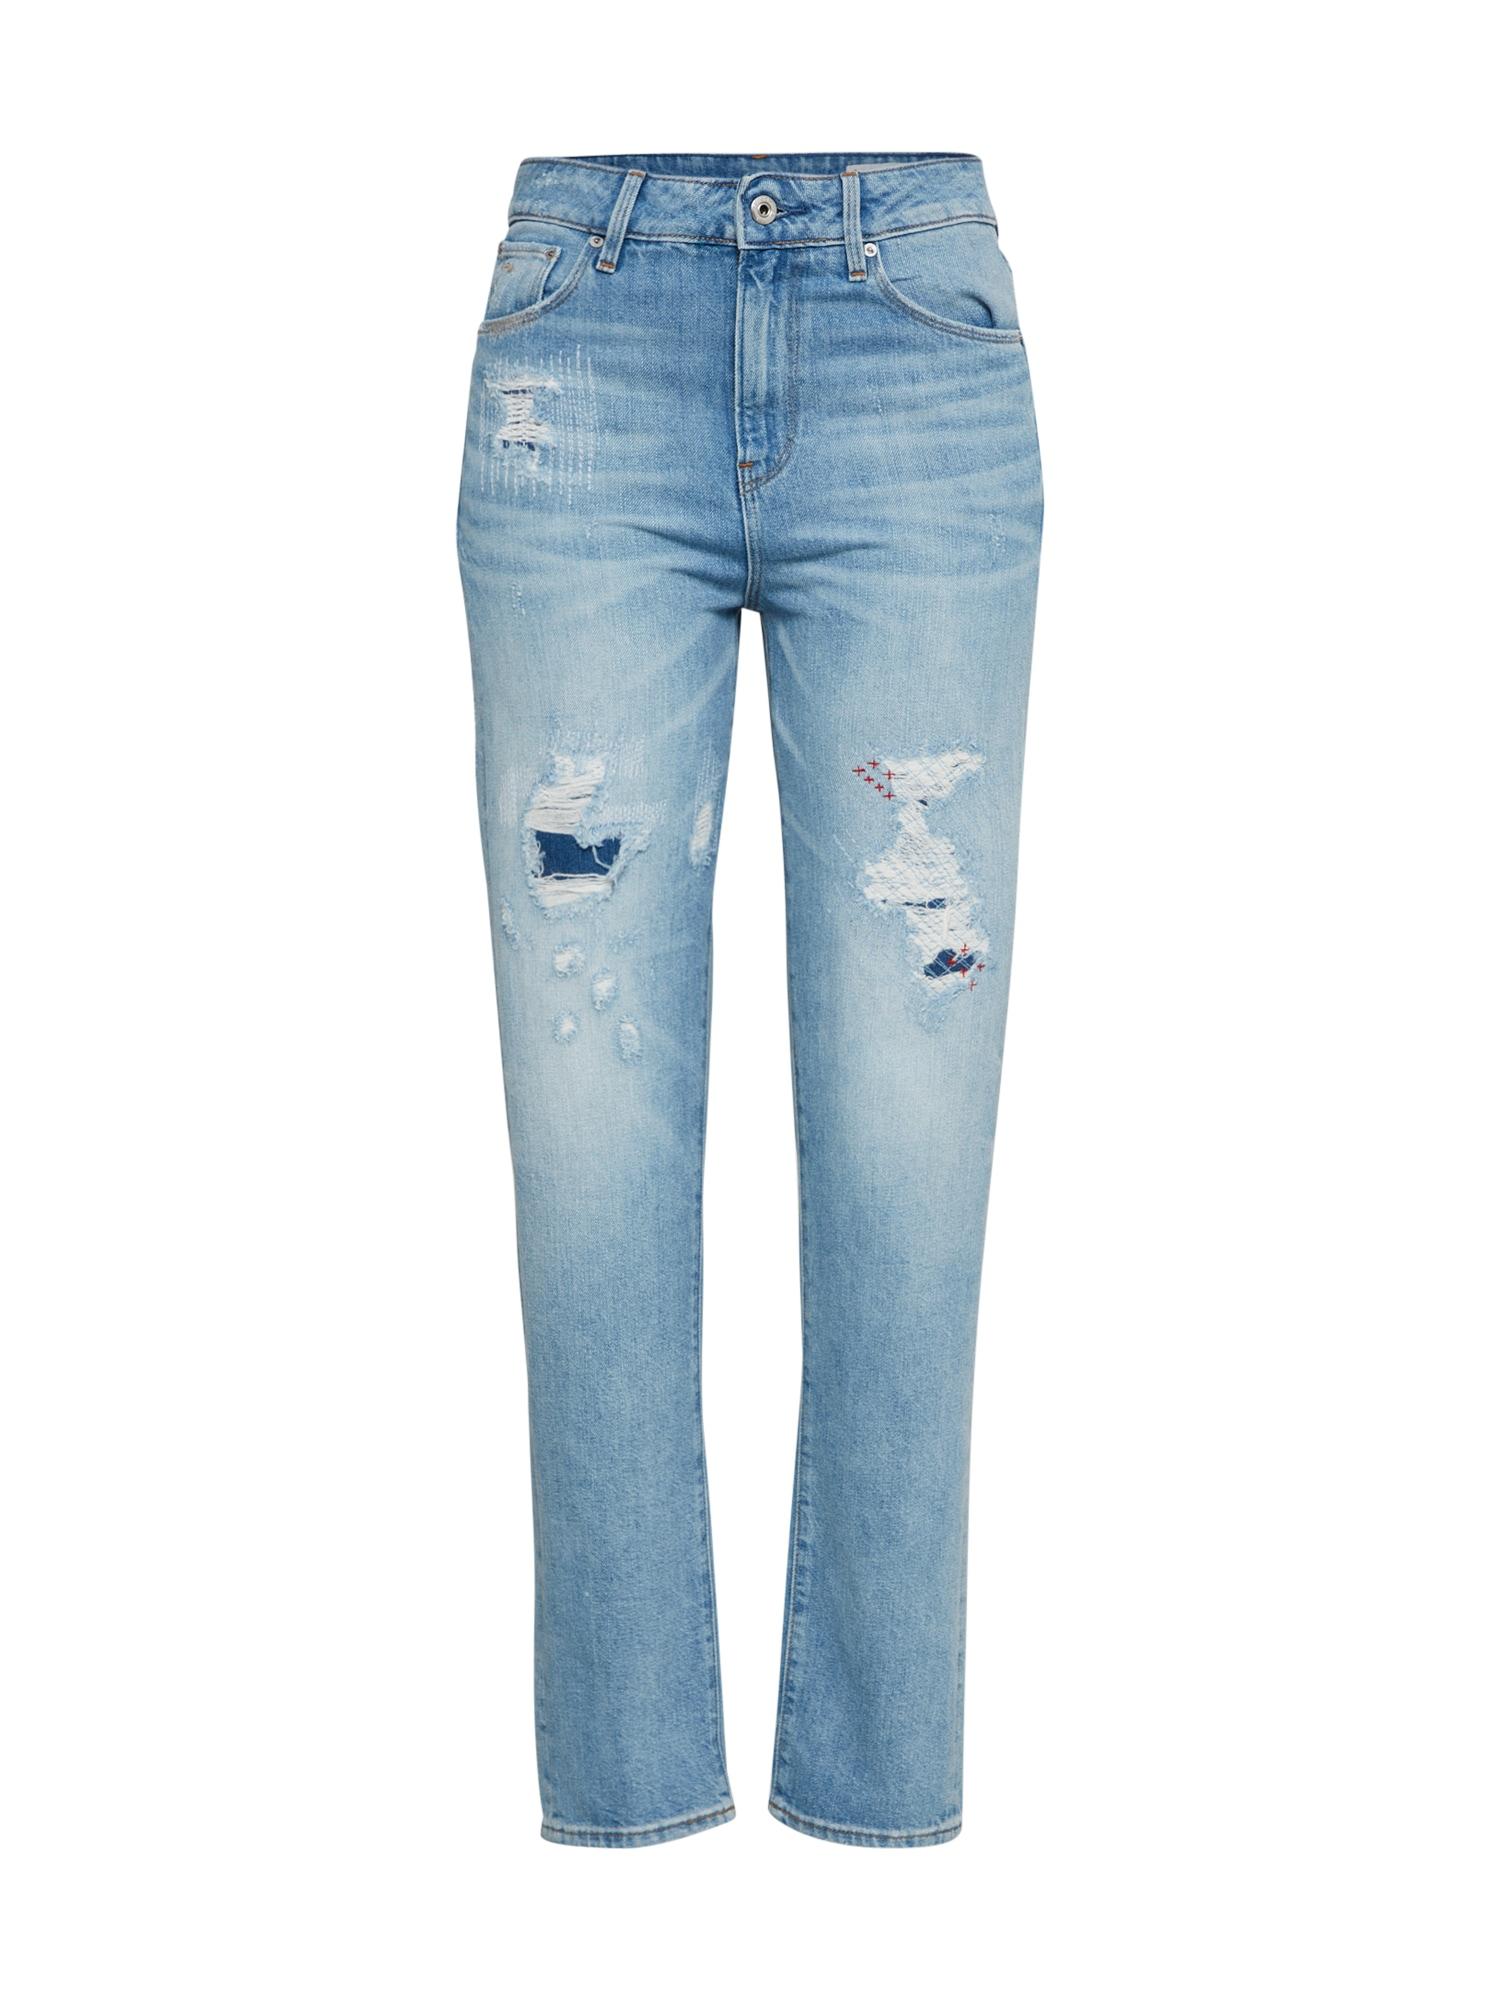 Džíny 3301 High Straight 90s Ankle Wmn modrá džínovina G-STAR RAW